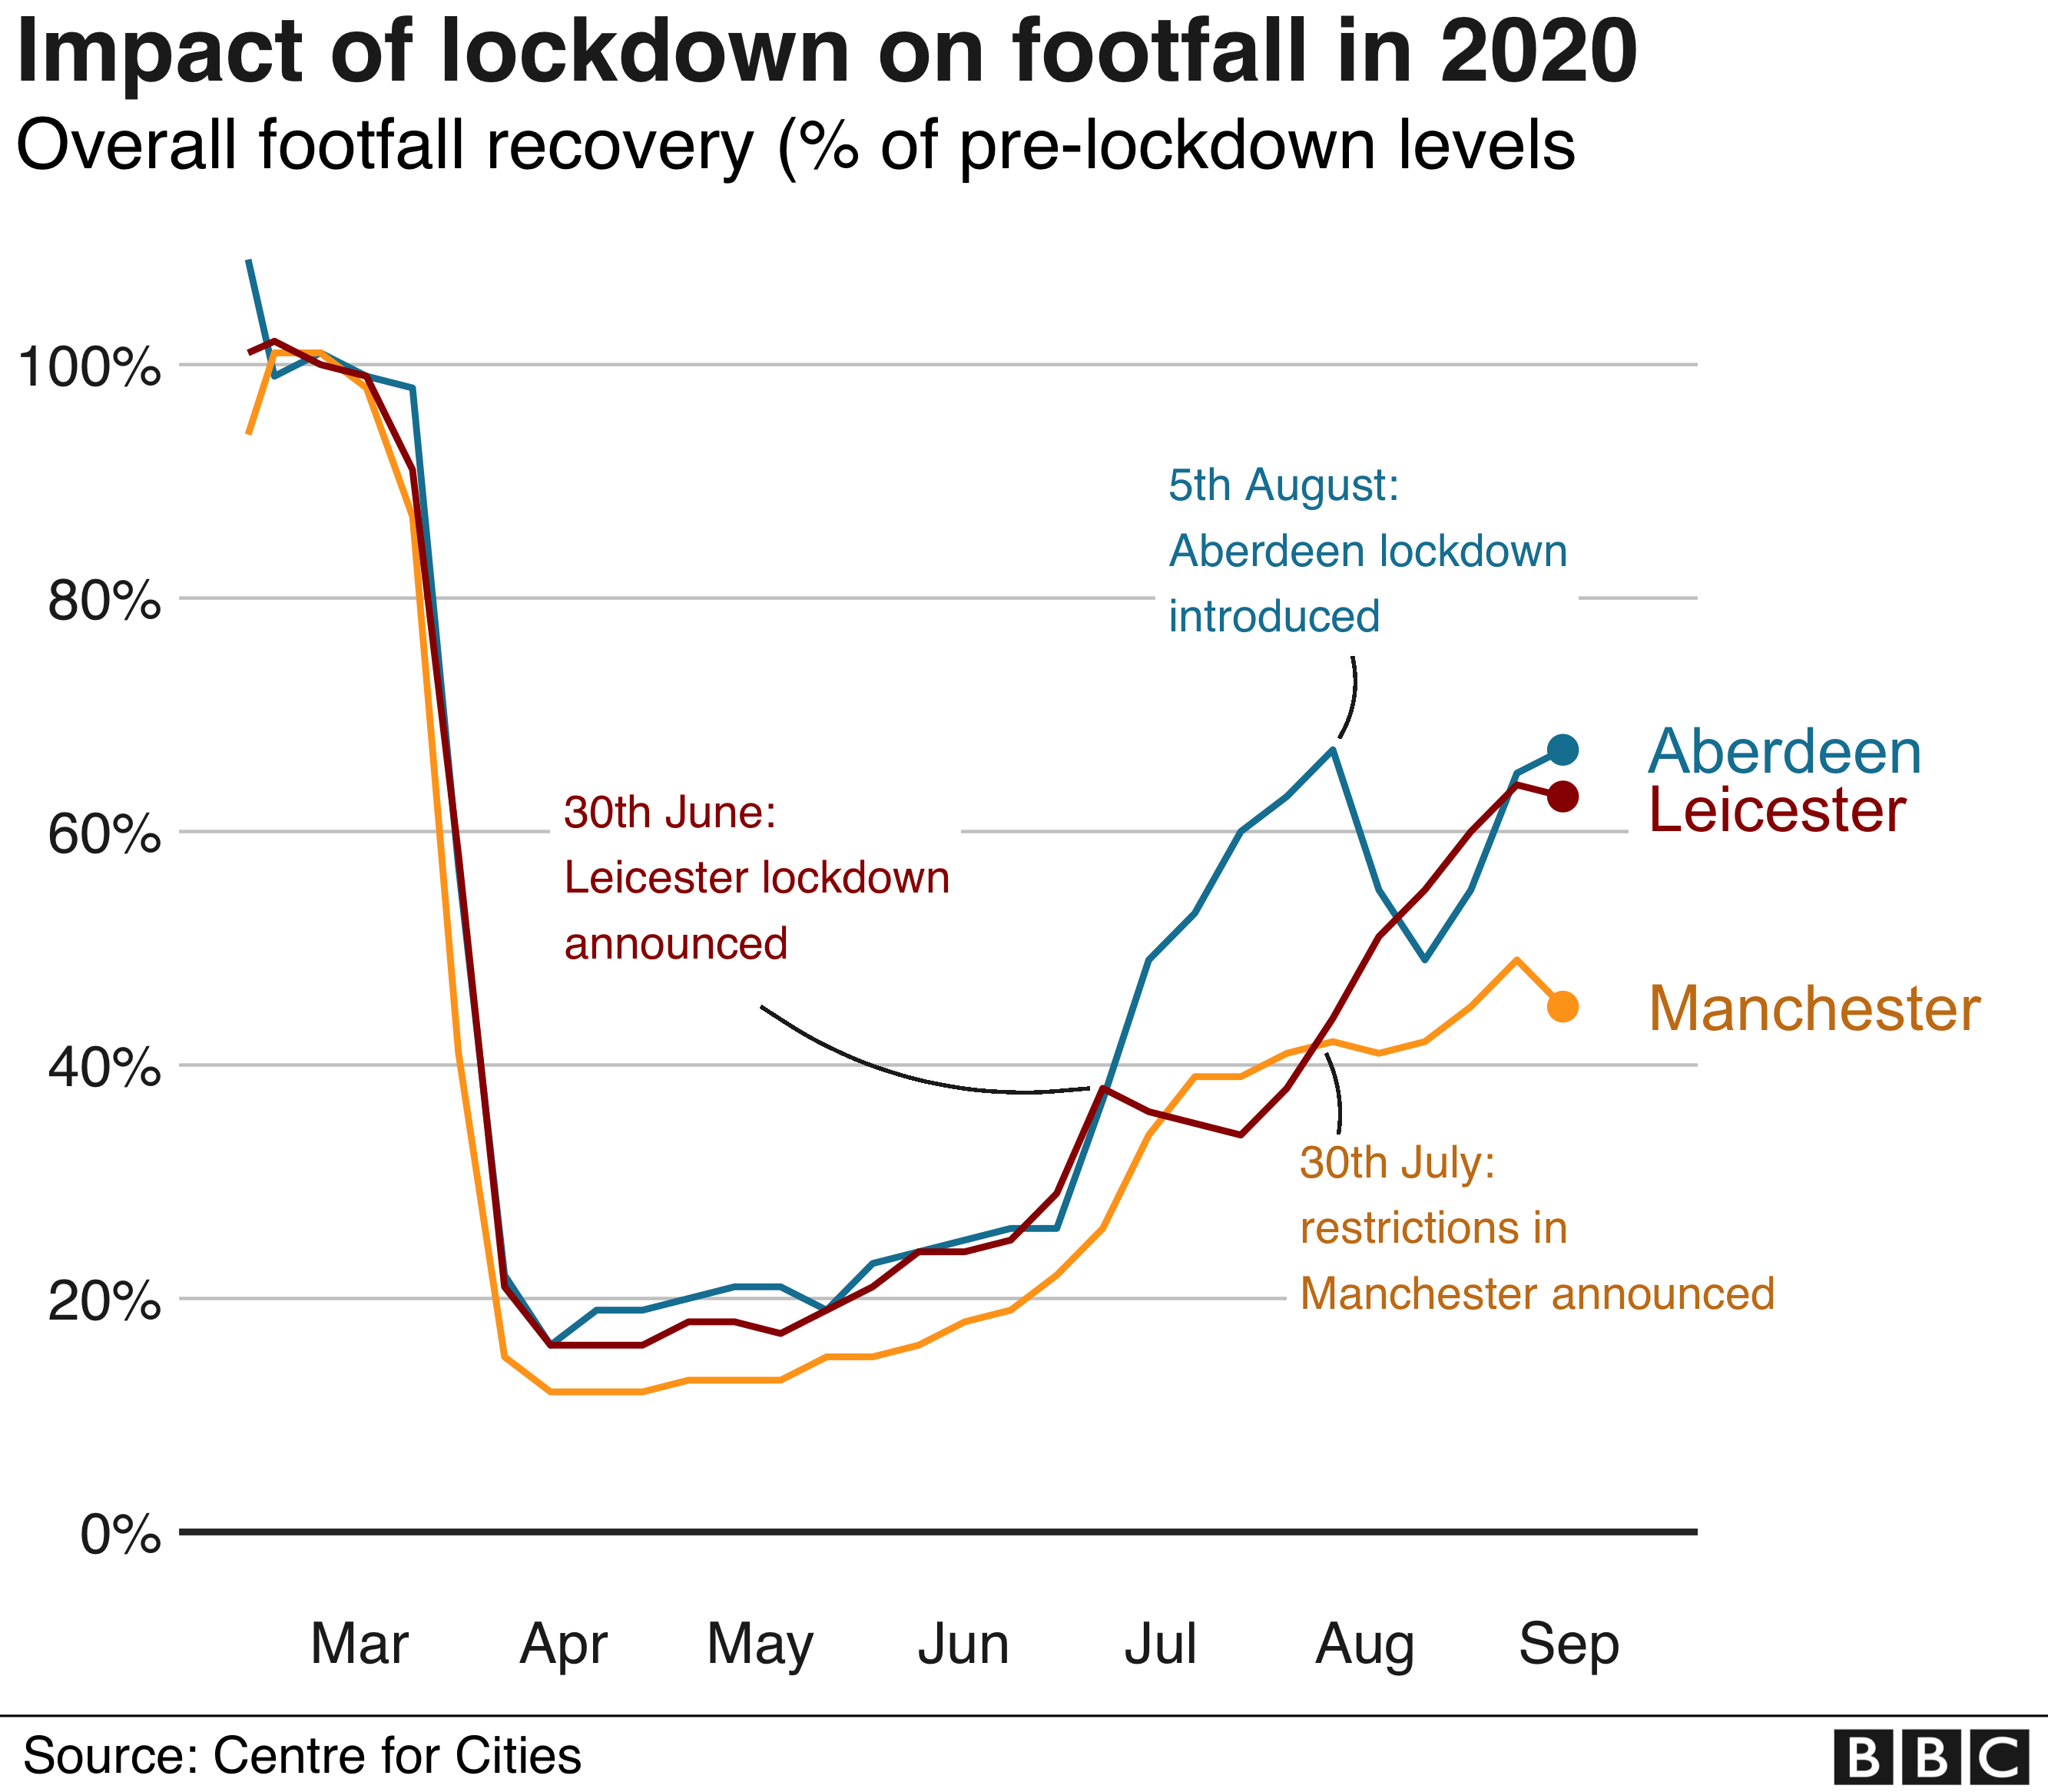 Impact of lockdown on footfall in 2020